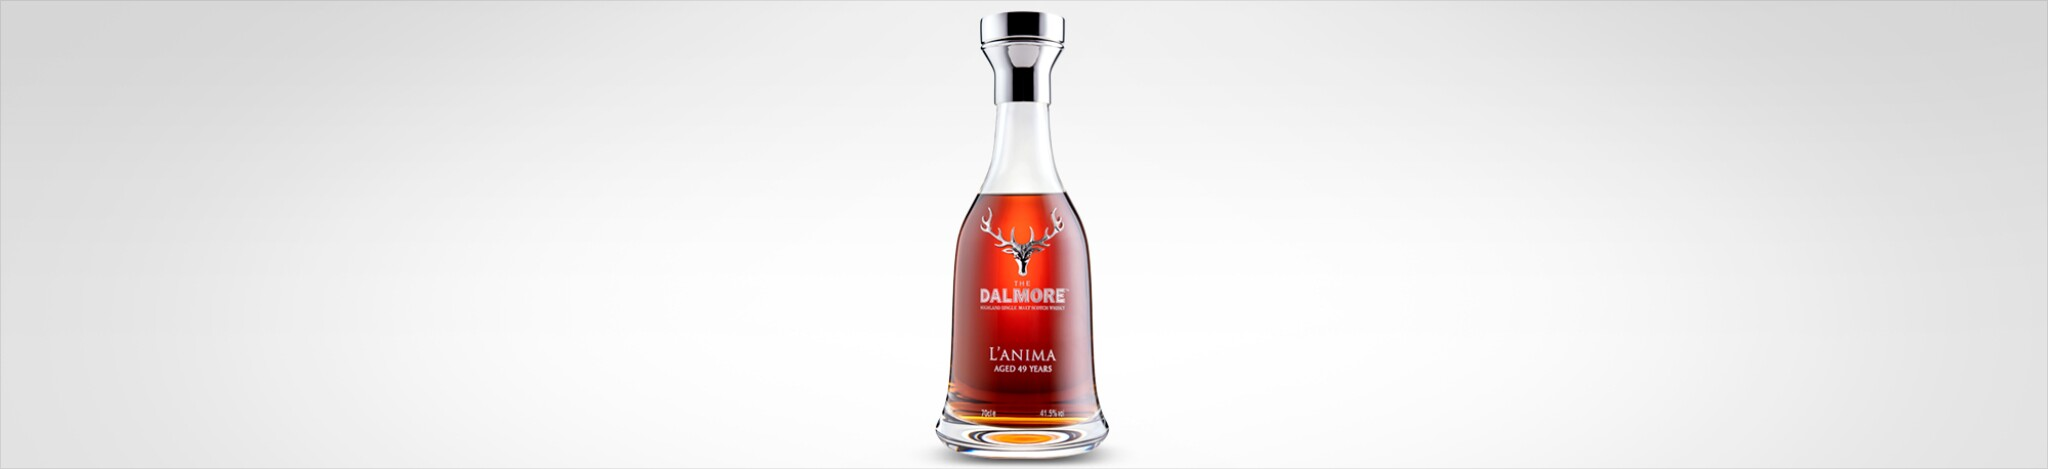 Distilled | Dalmore L'Anima 49 + Bottura & Other Spirits